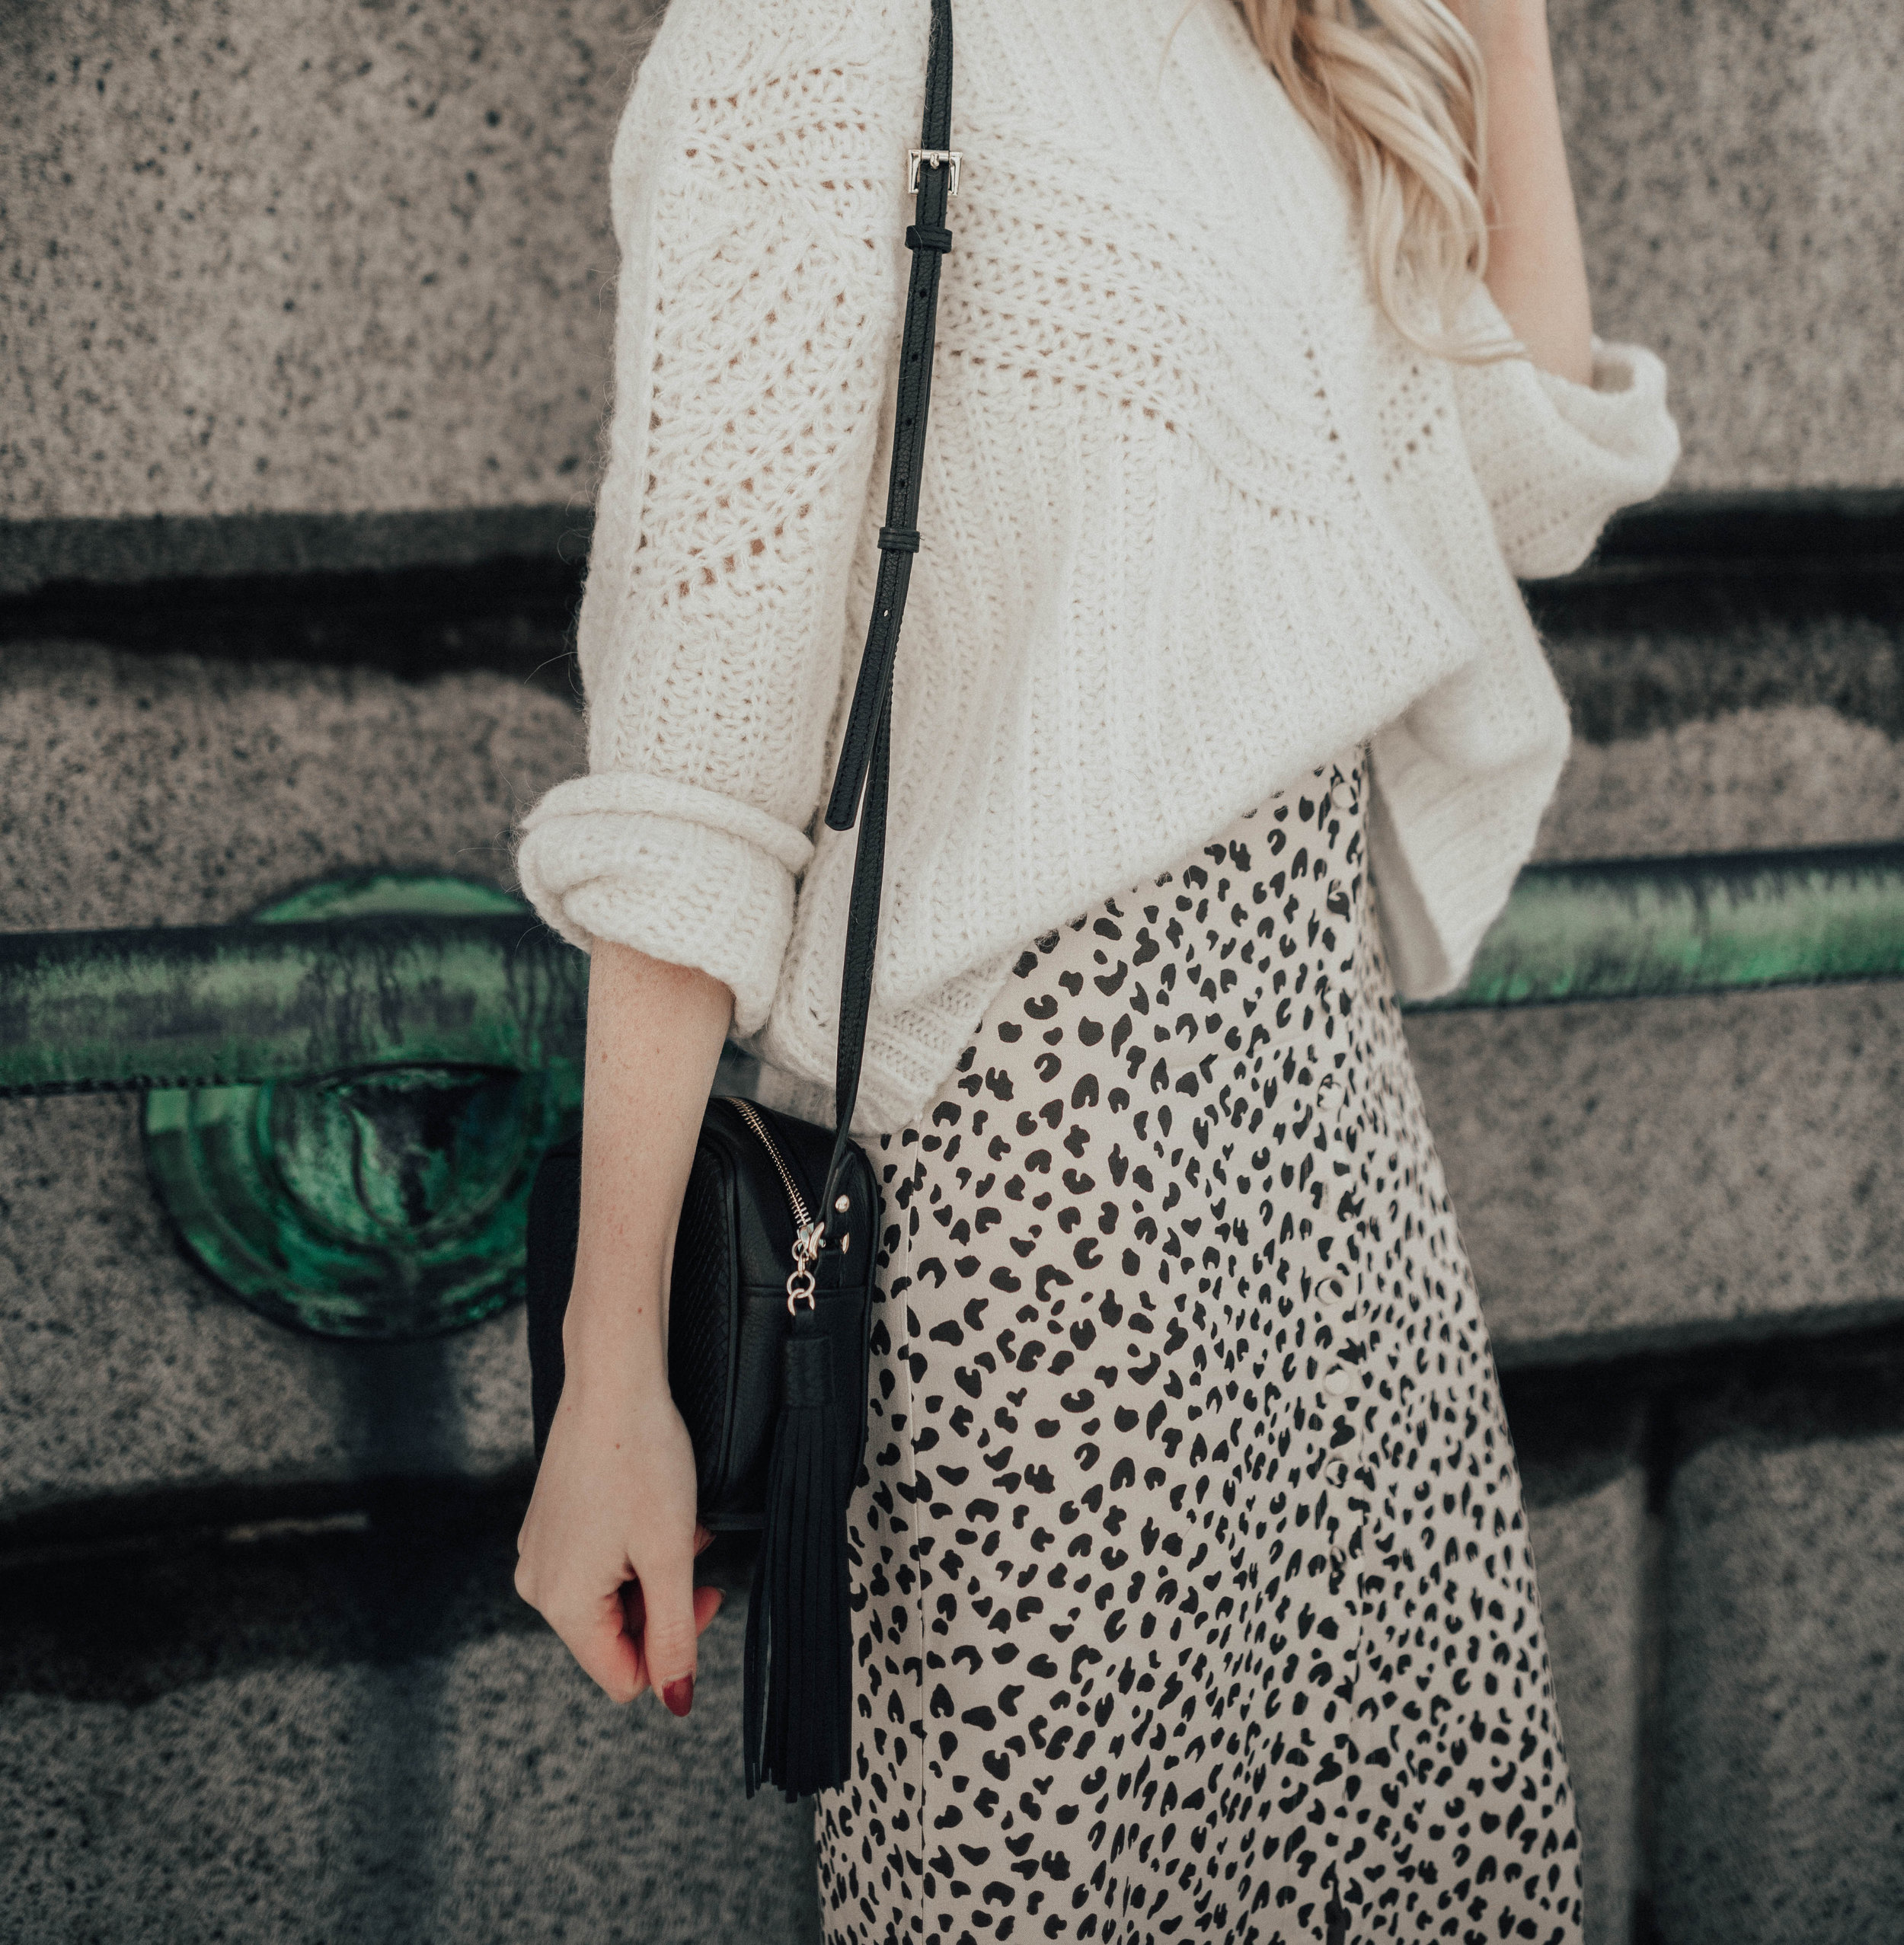 Leopard Print Midi Skirt Outfit (via @maevestier)